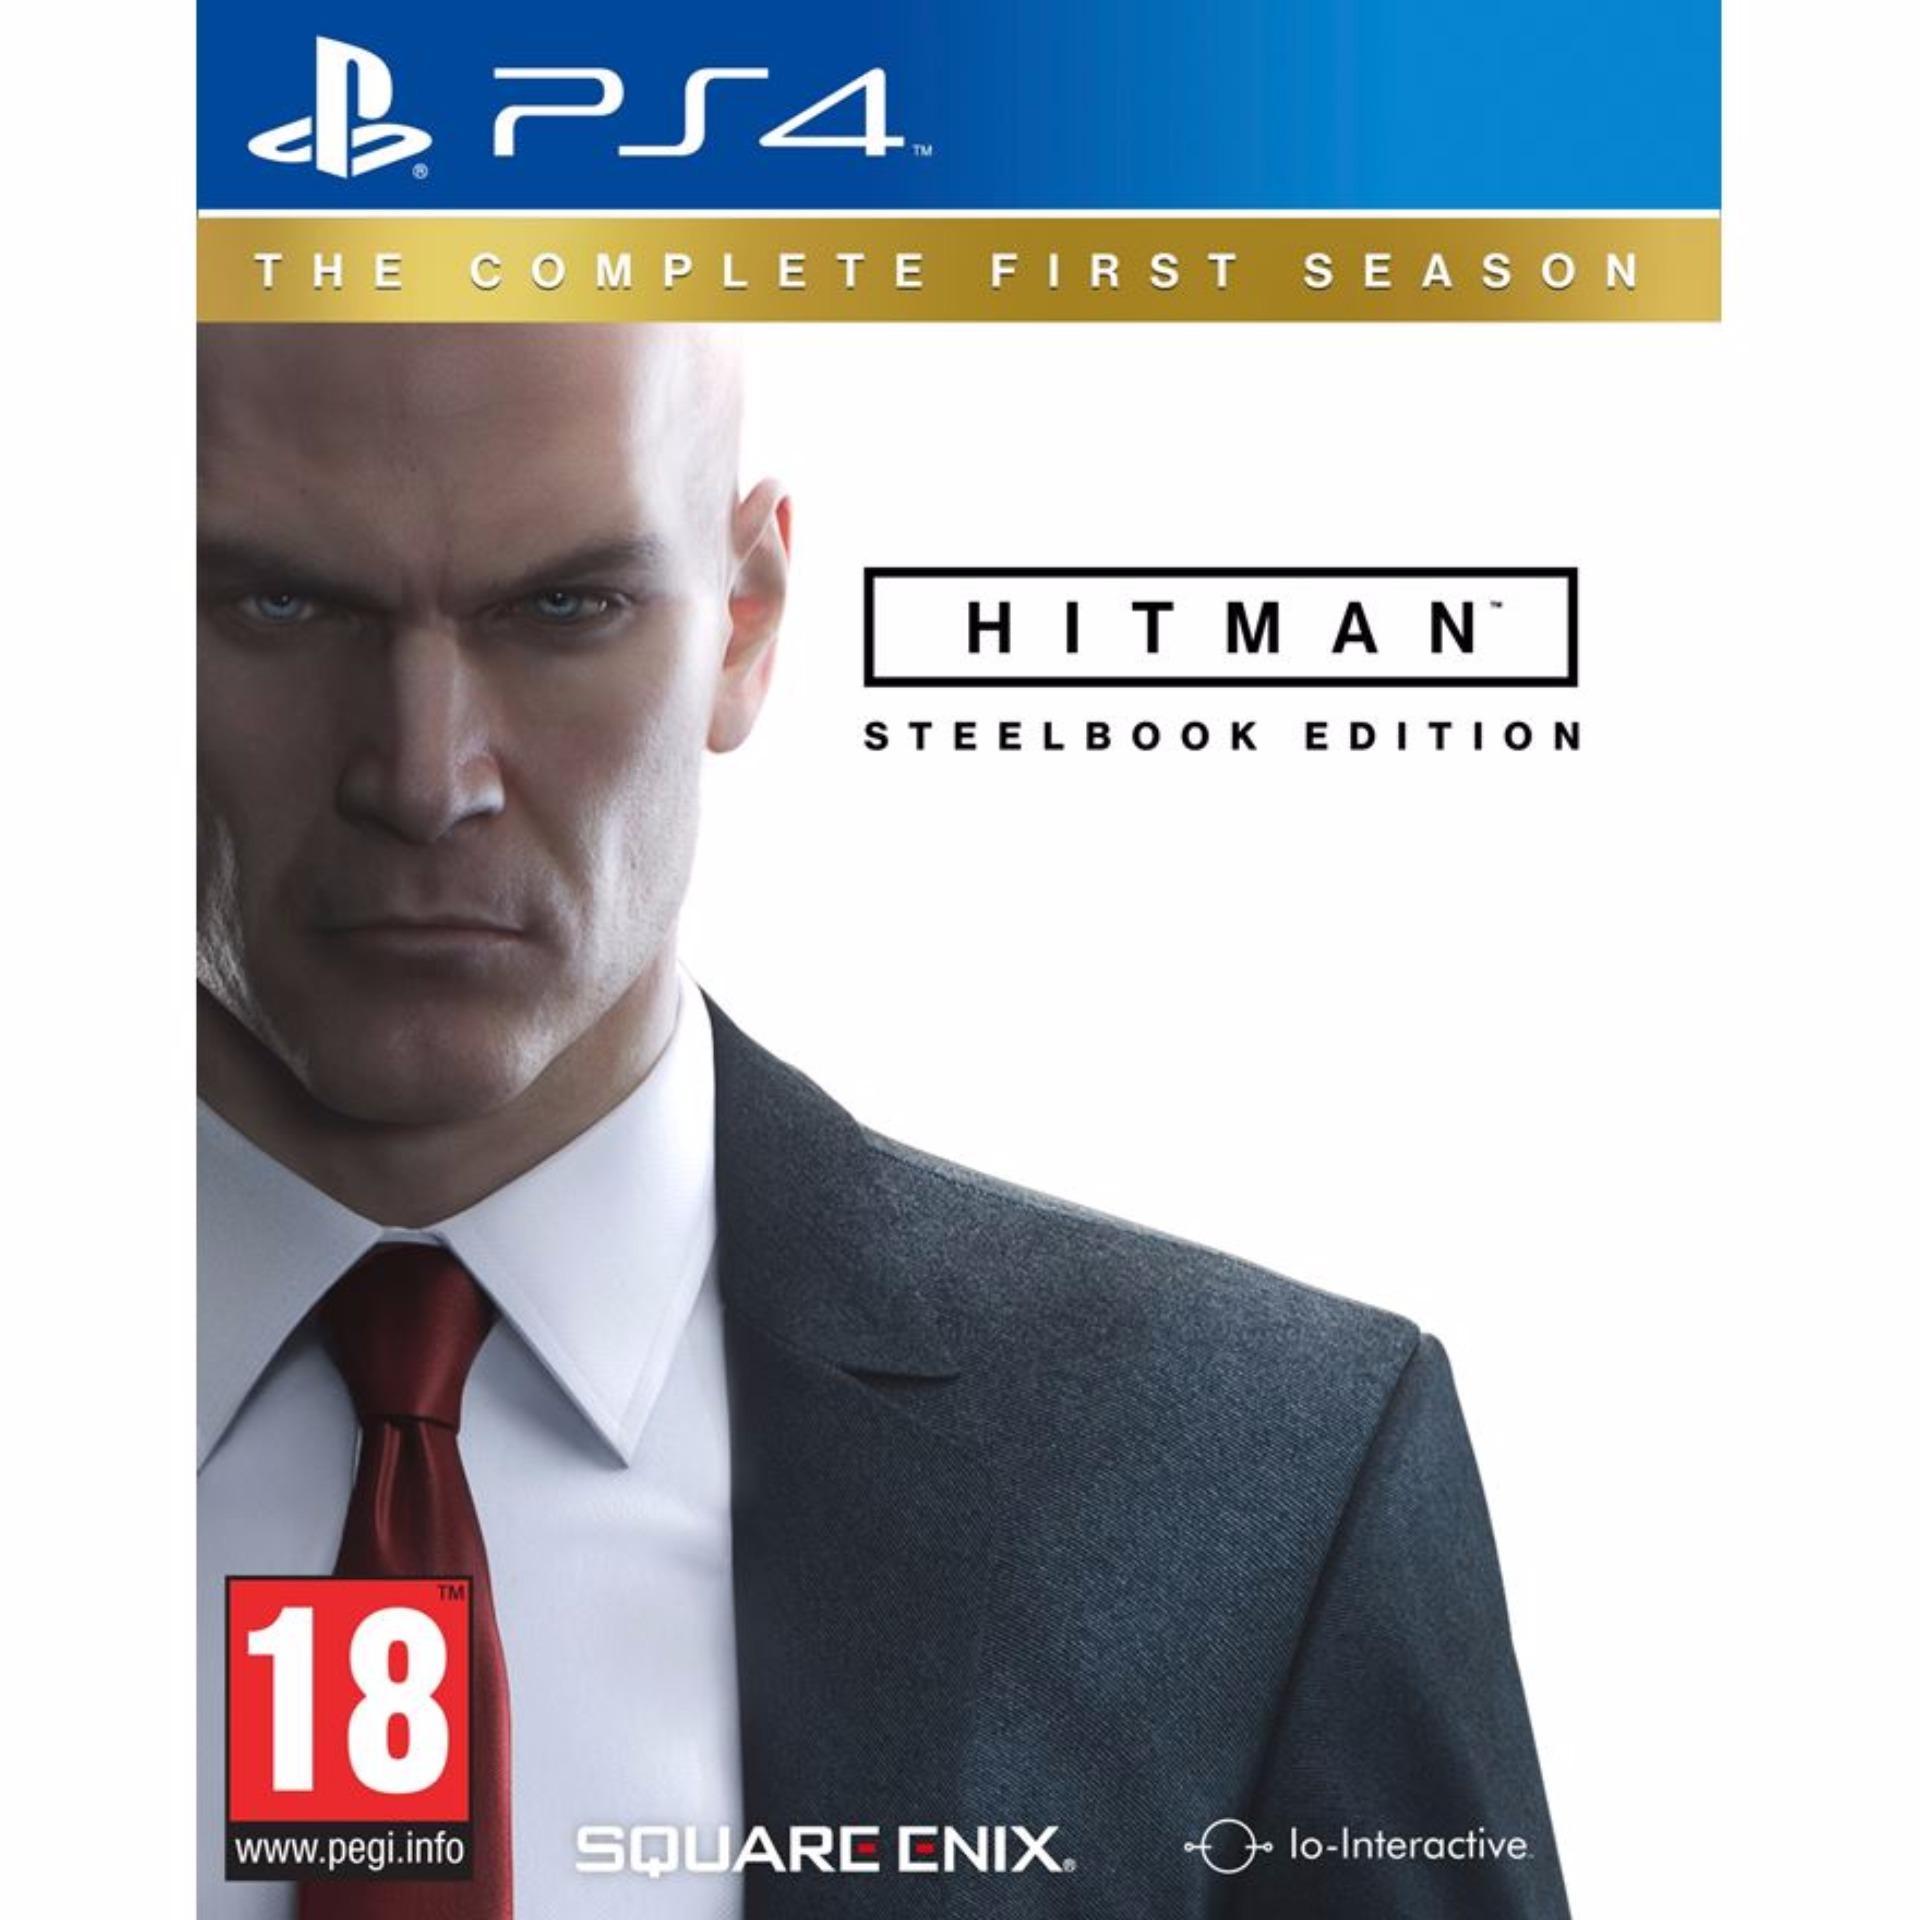 Đĩa Game Ps4 Hitman The Complete First Season